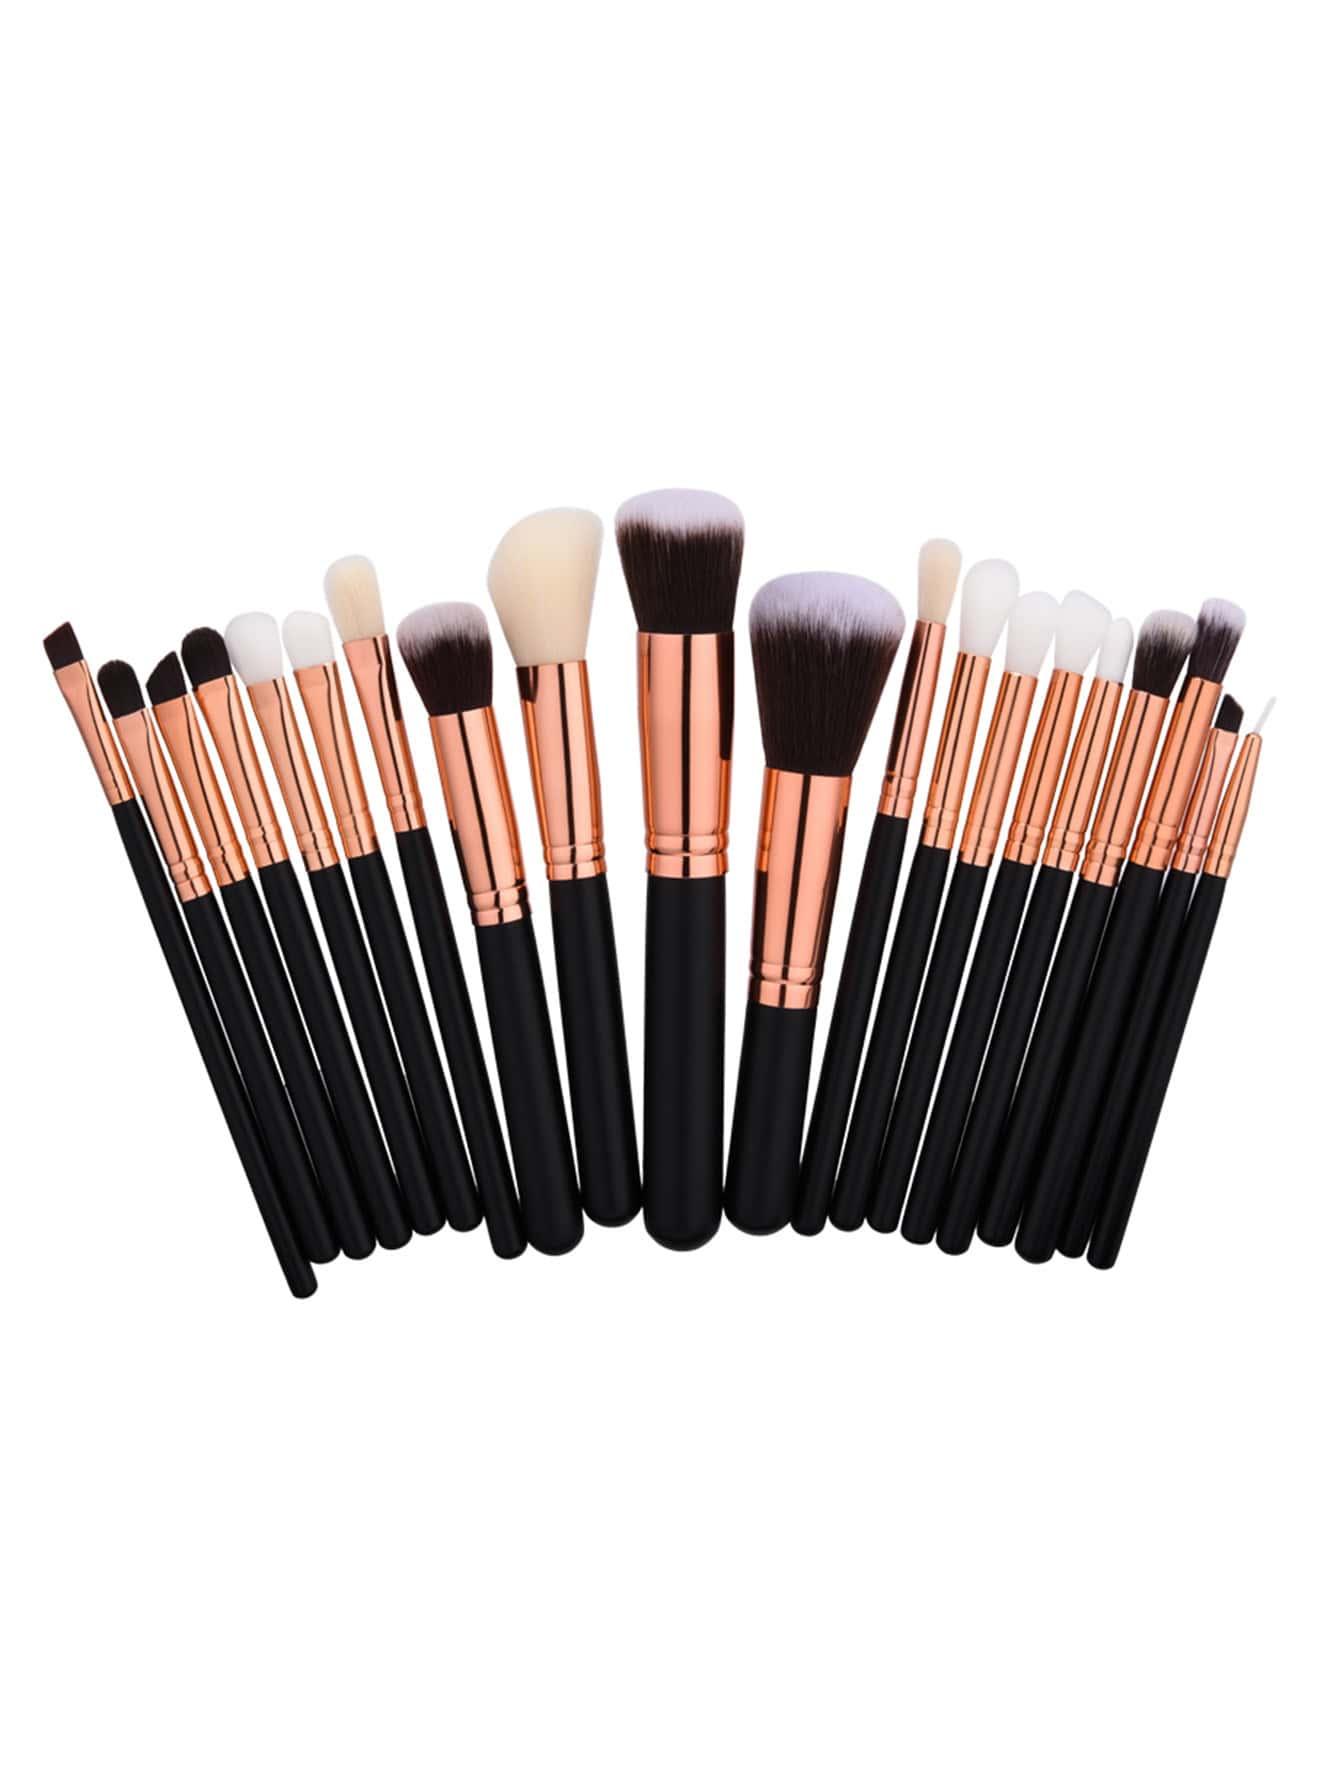 Image of Professional Makeup Brush 20pcs